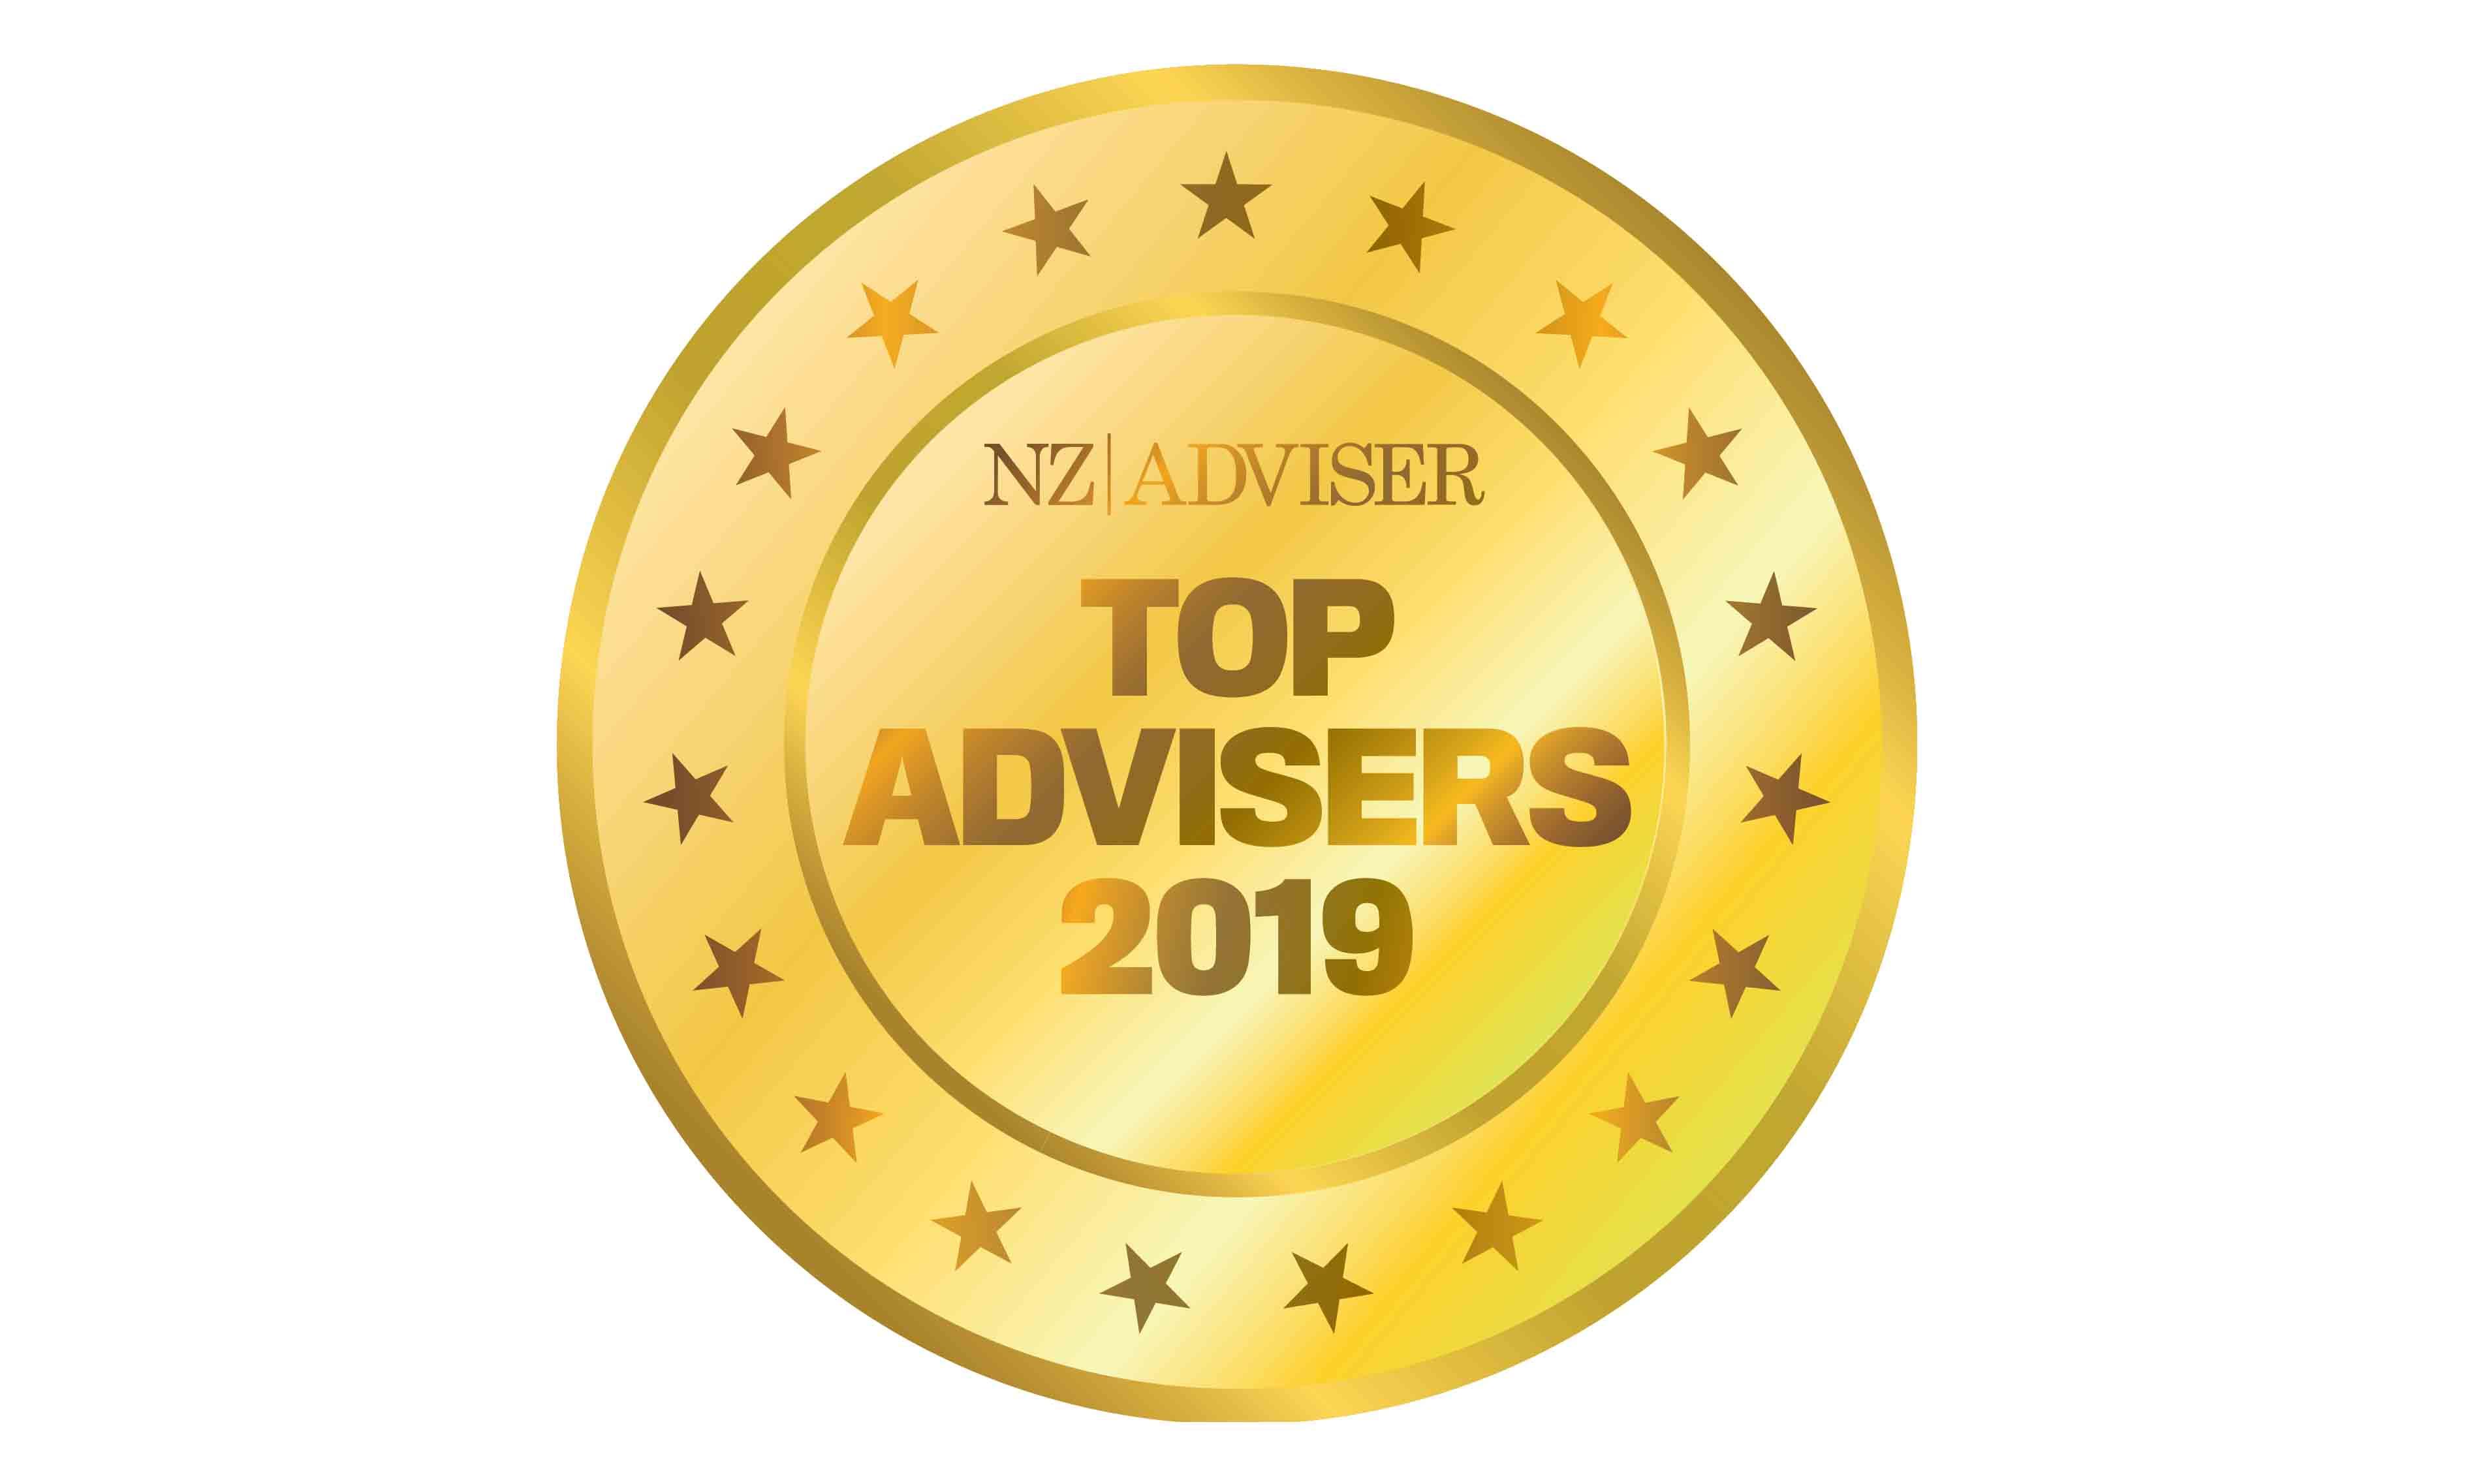 Top Advisers 2019